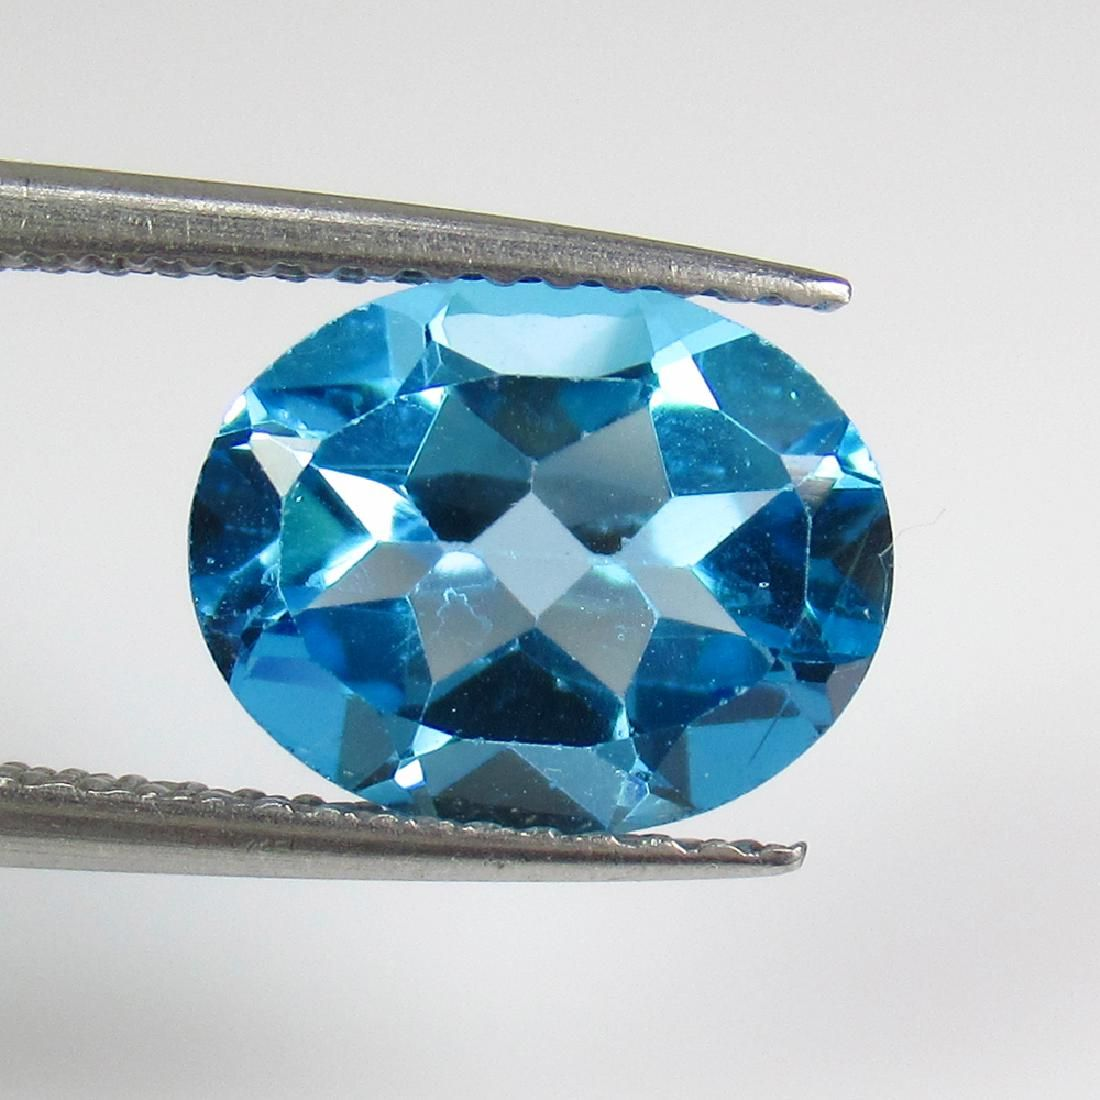 2.97 Ct Genuine Swiss Blue Topaz 10X8 mm Oval Cut